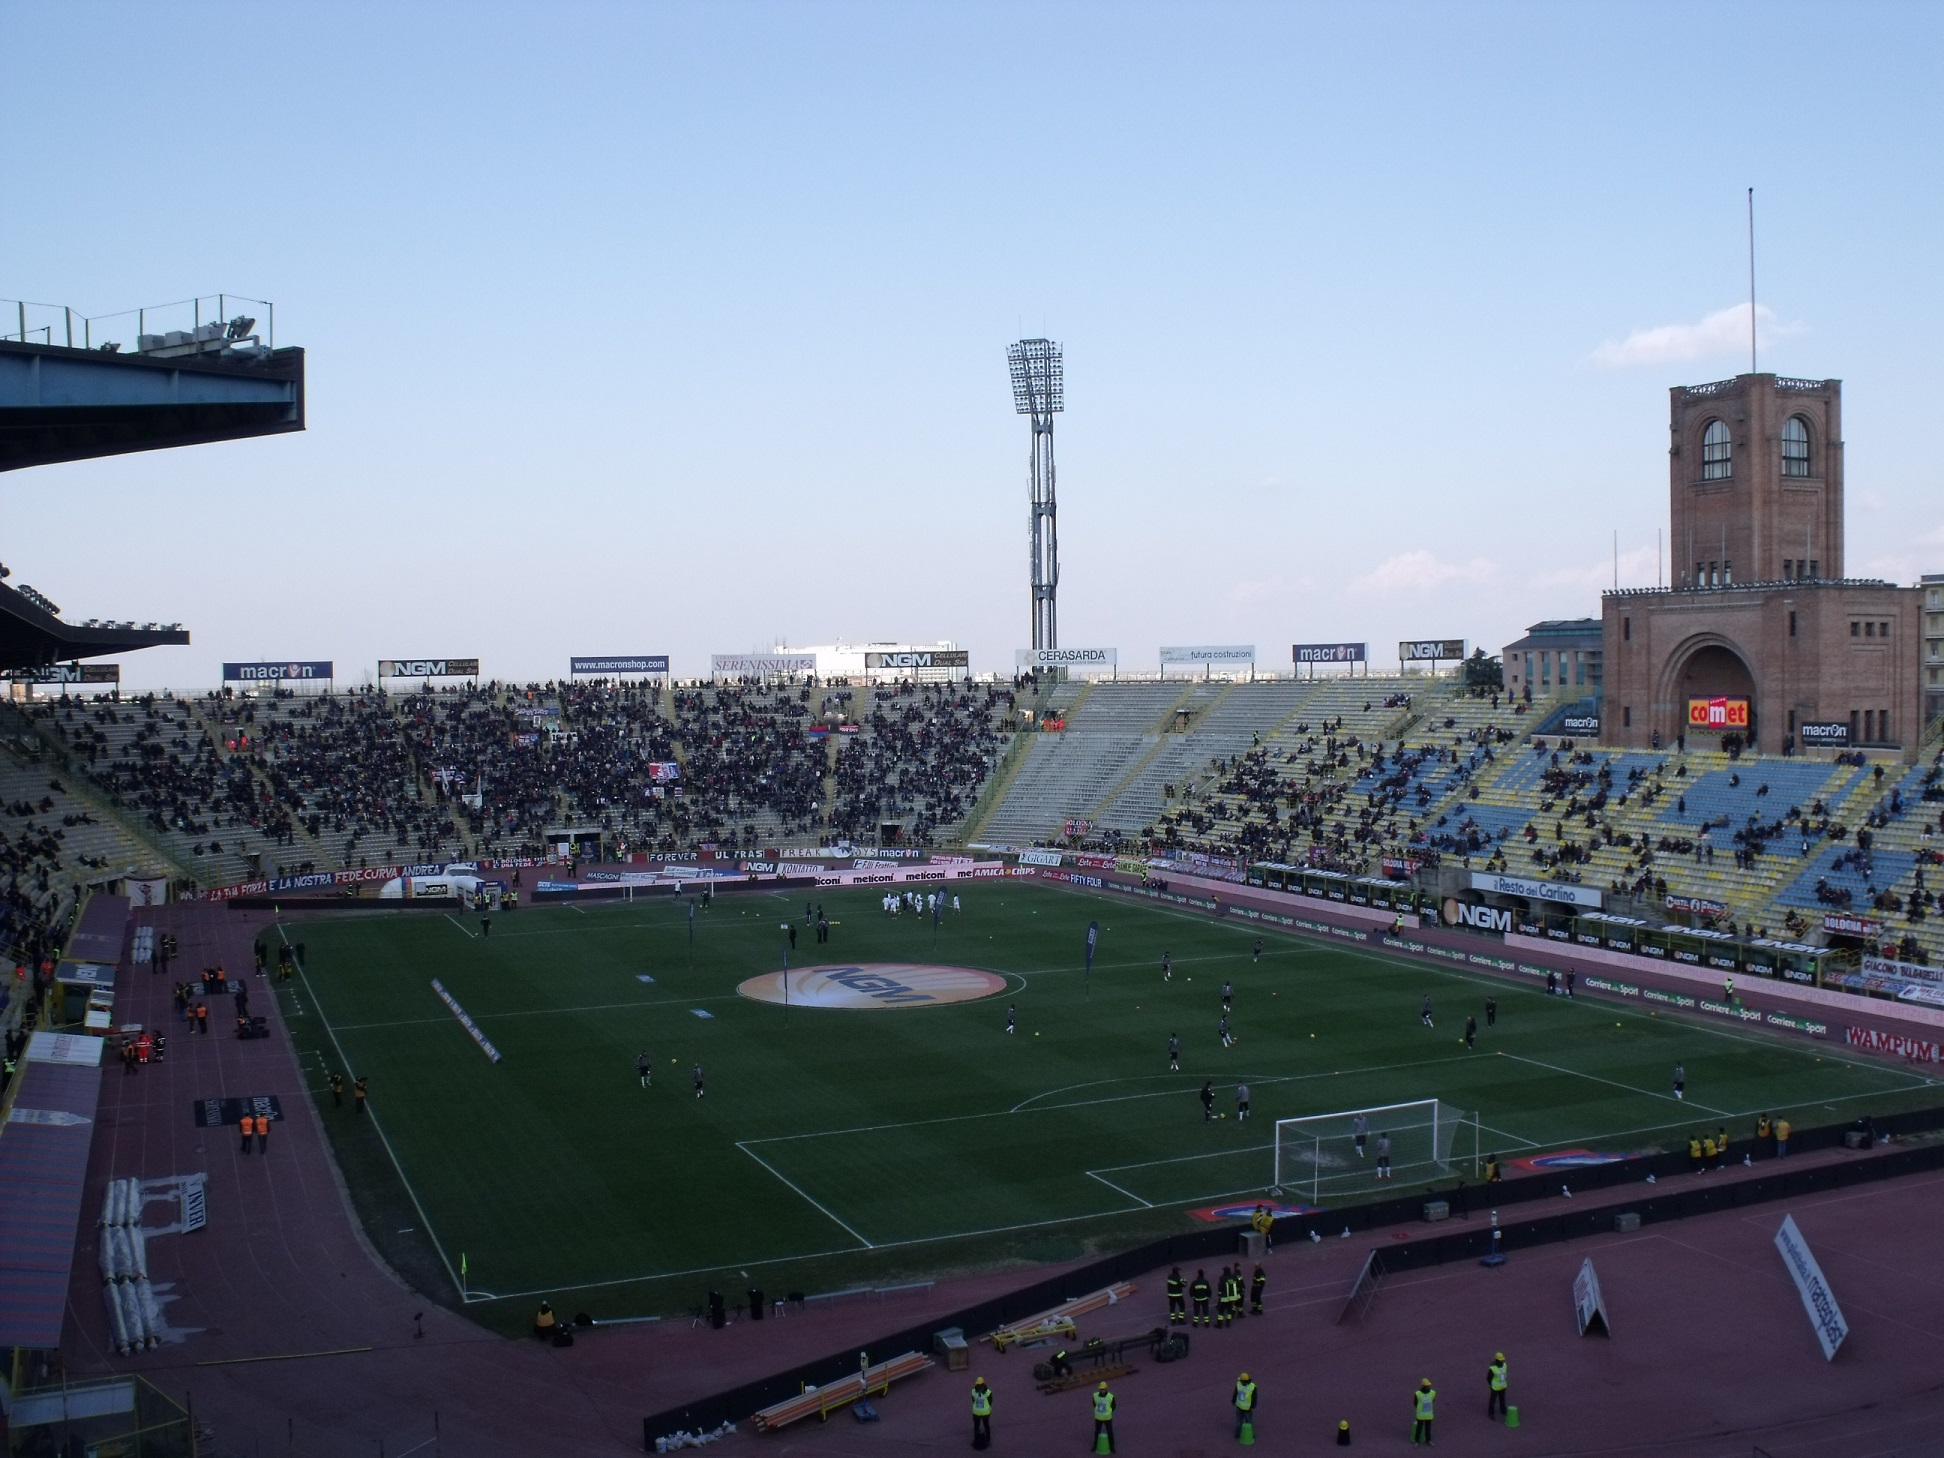 Otra vista del estadio (WIKIPEDIA).